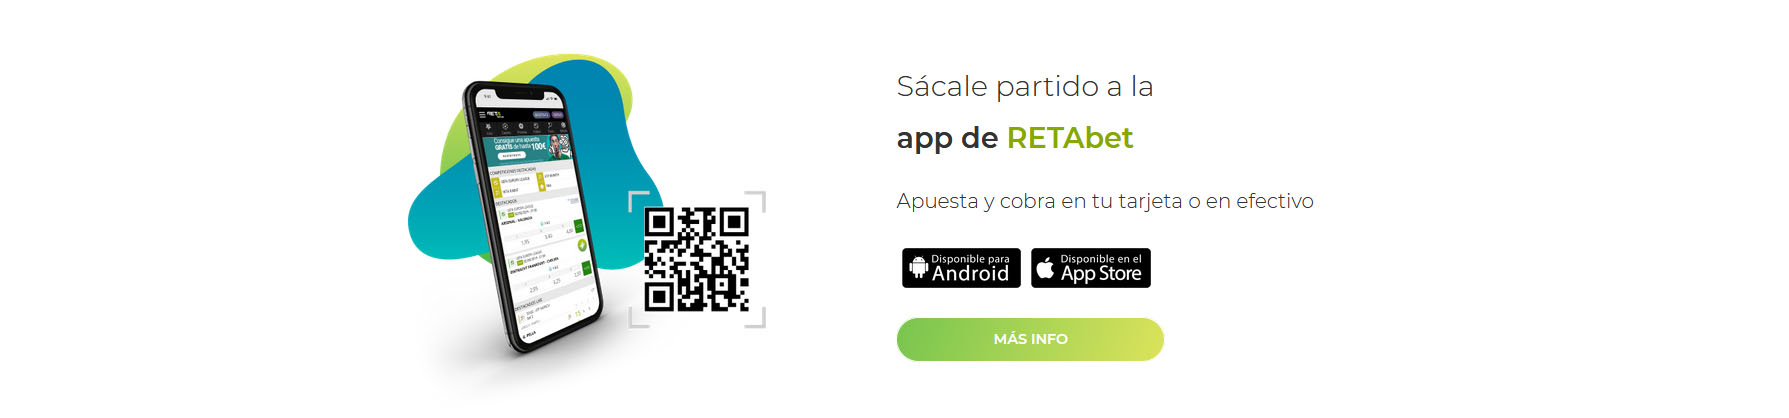 App Retabet